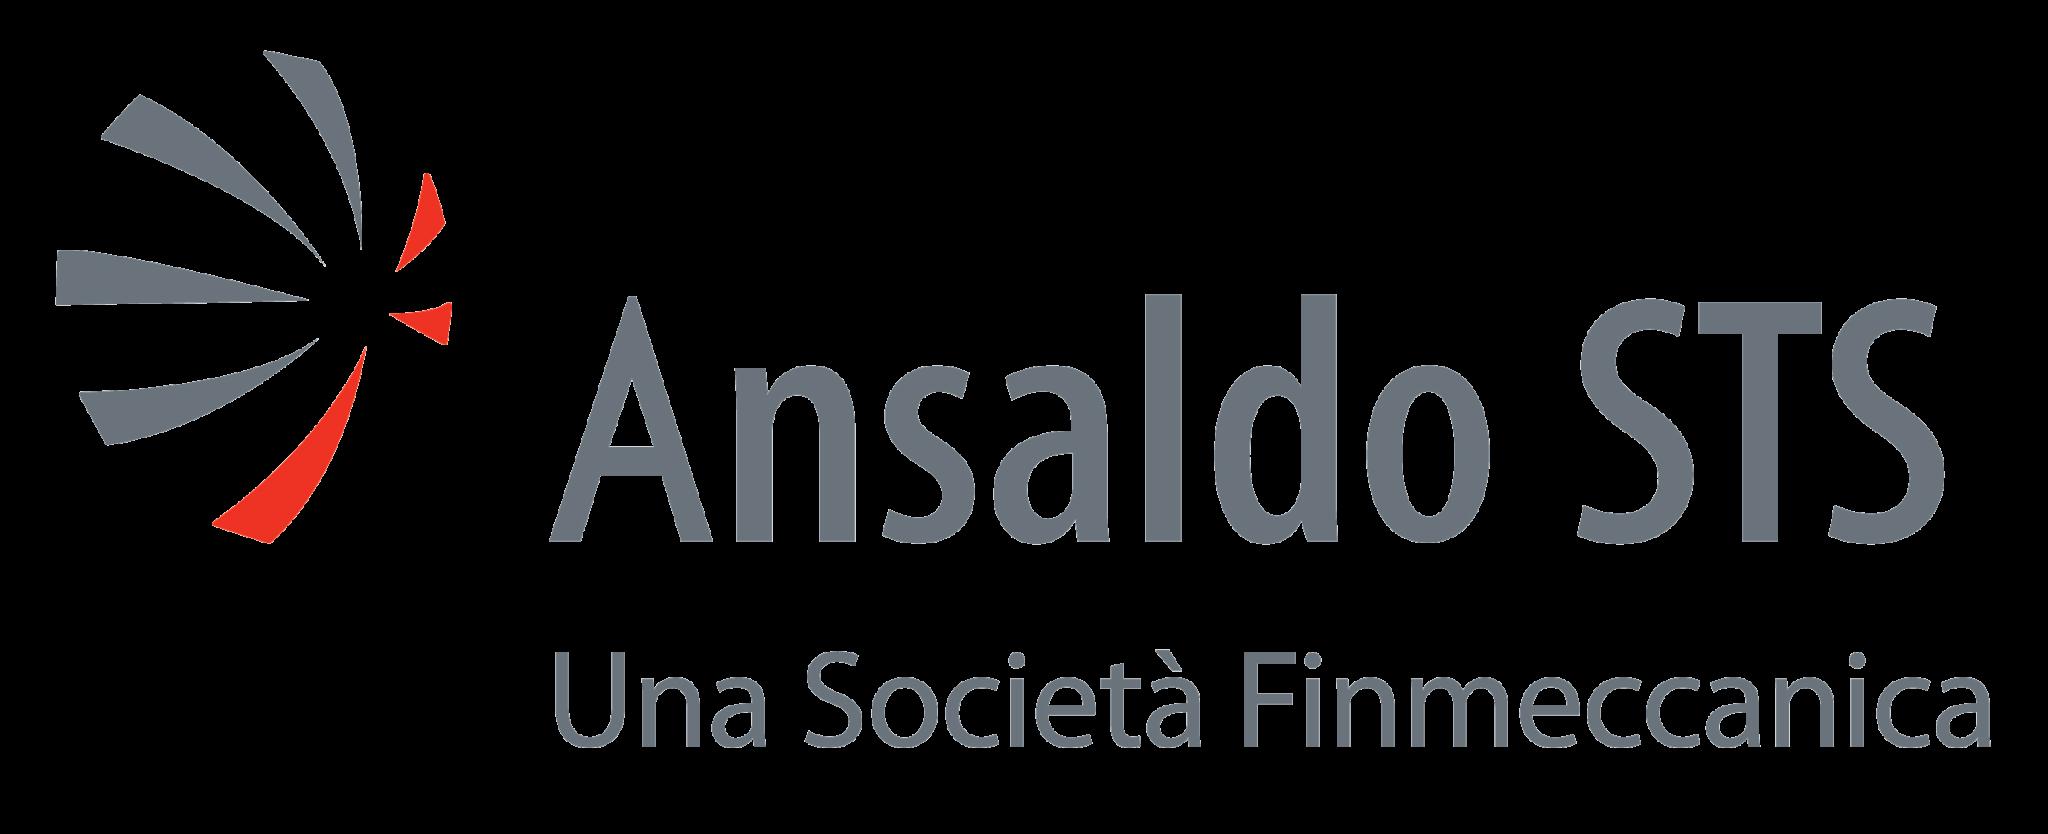 Ansaldo Sts SpA